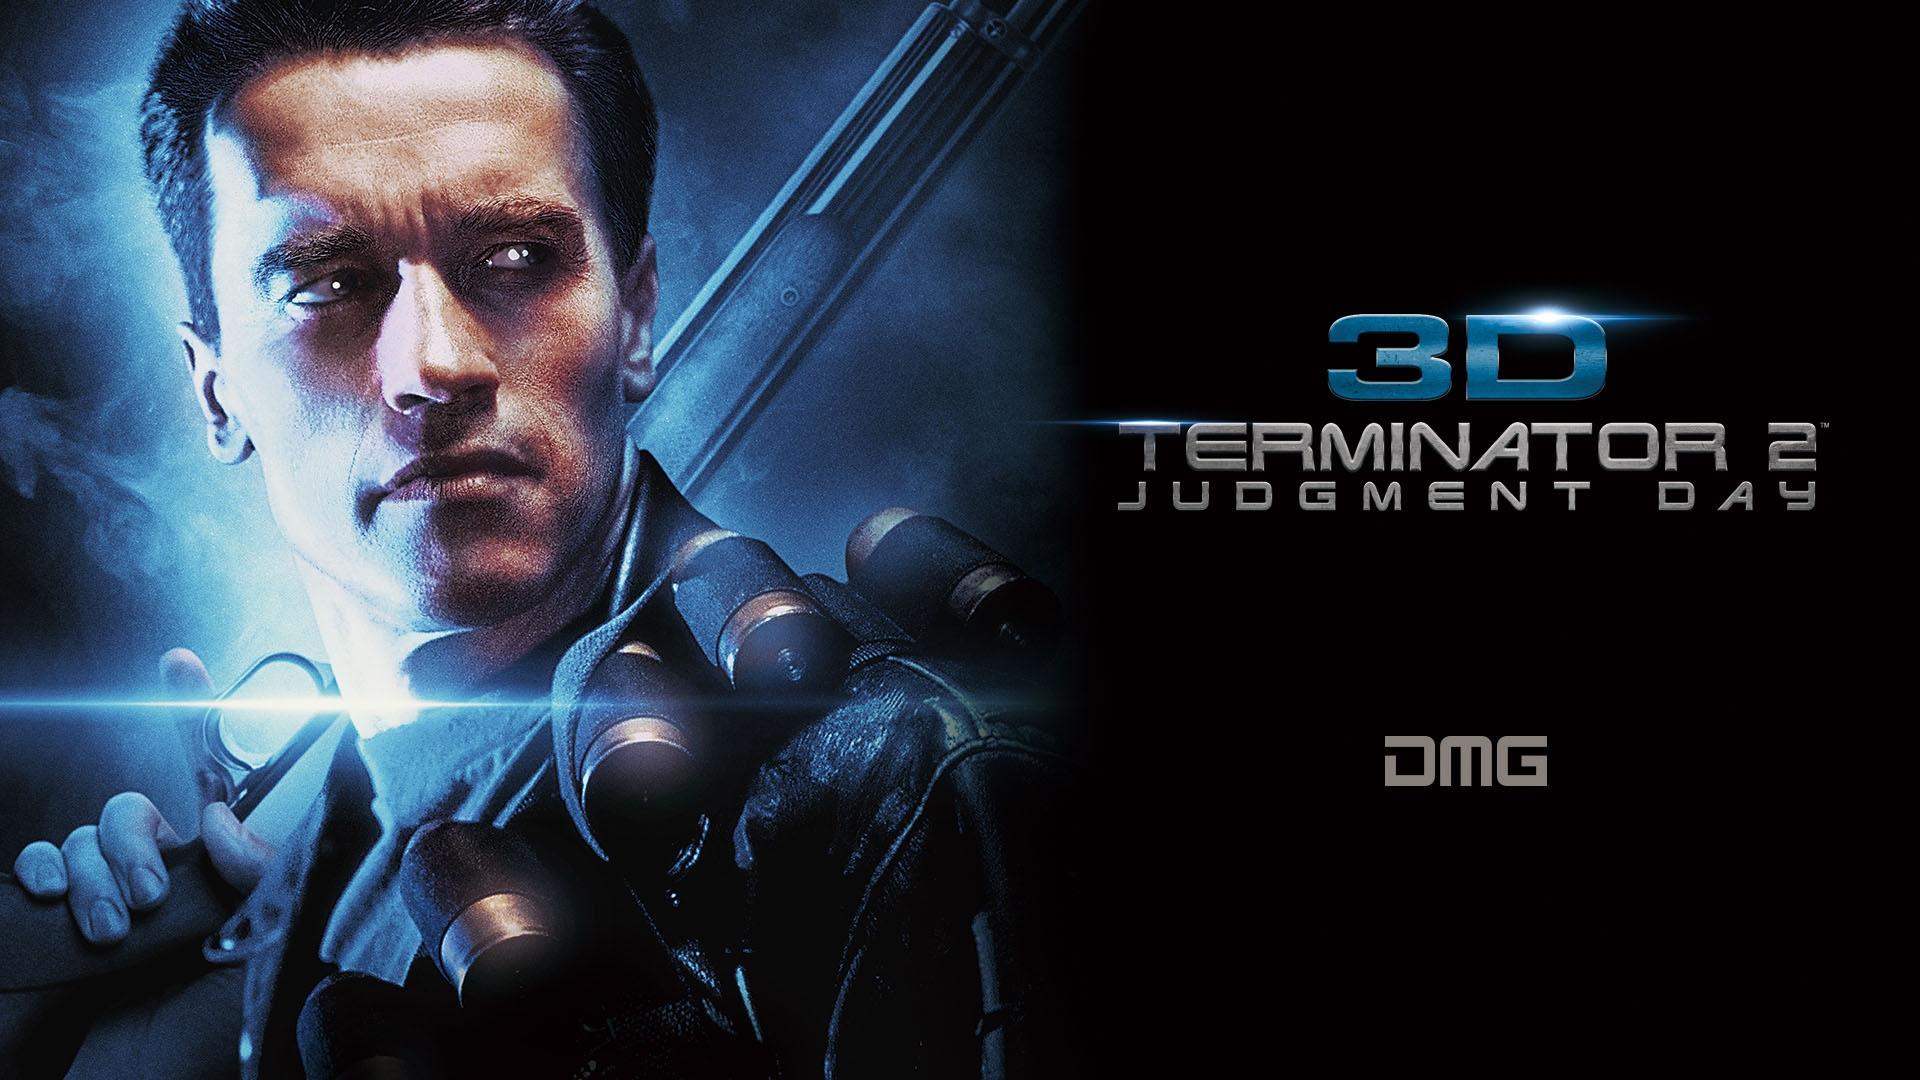 Terminator 2 3d 2017 official images - Terminator 2 wallpaper hd ...